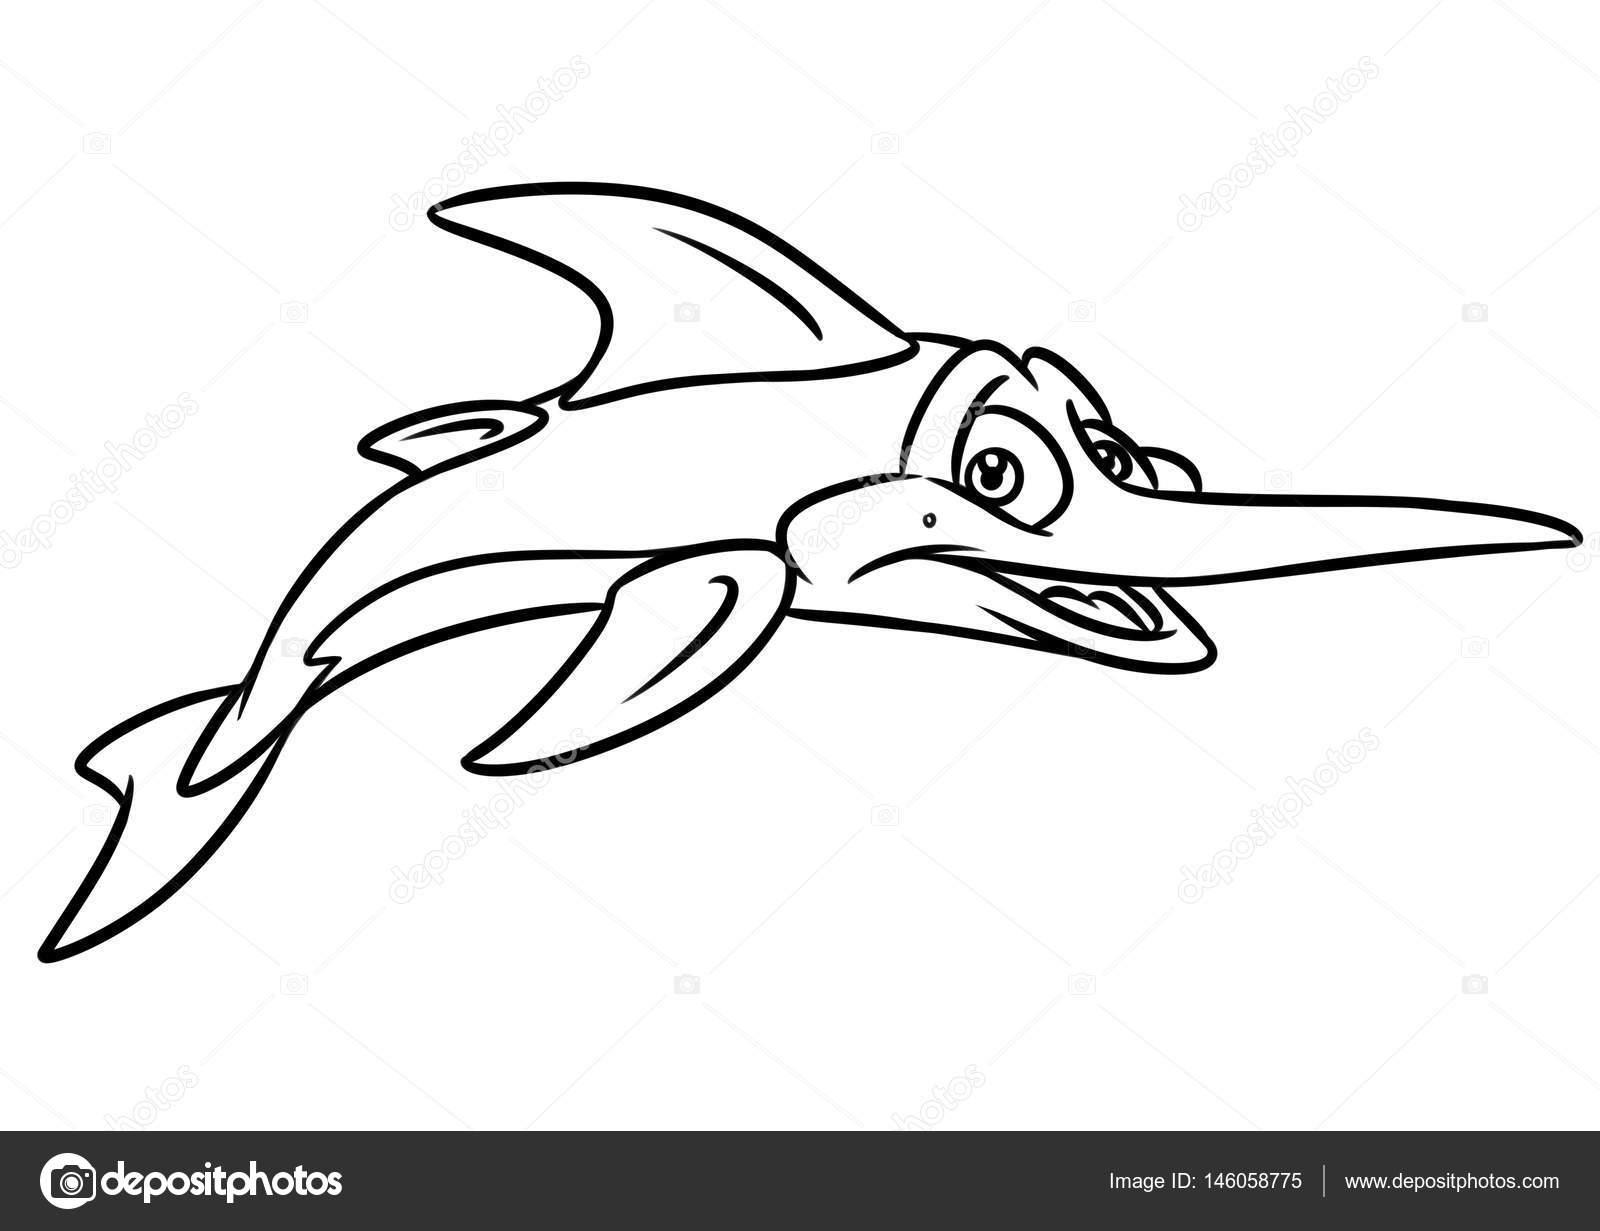 Swordfish Coloring Page Cartoon Illustrations Stock Photo